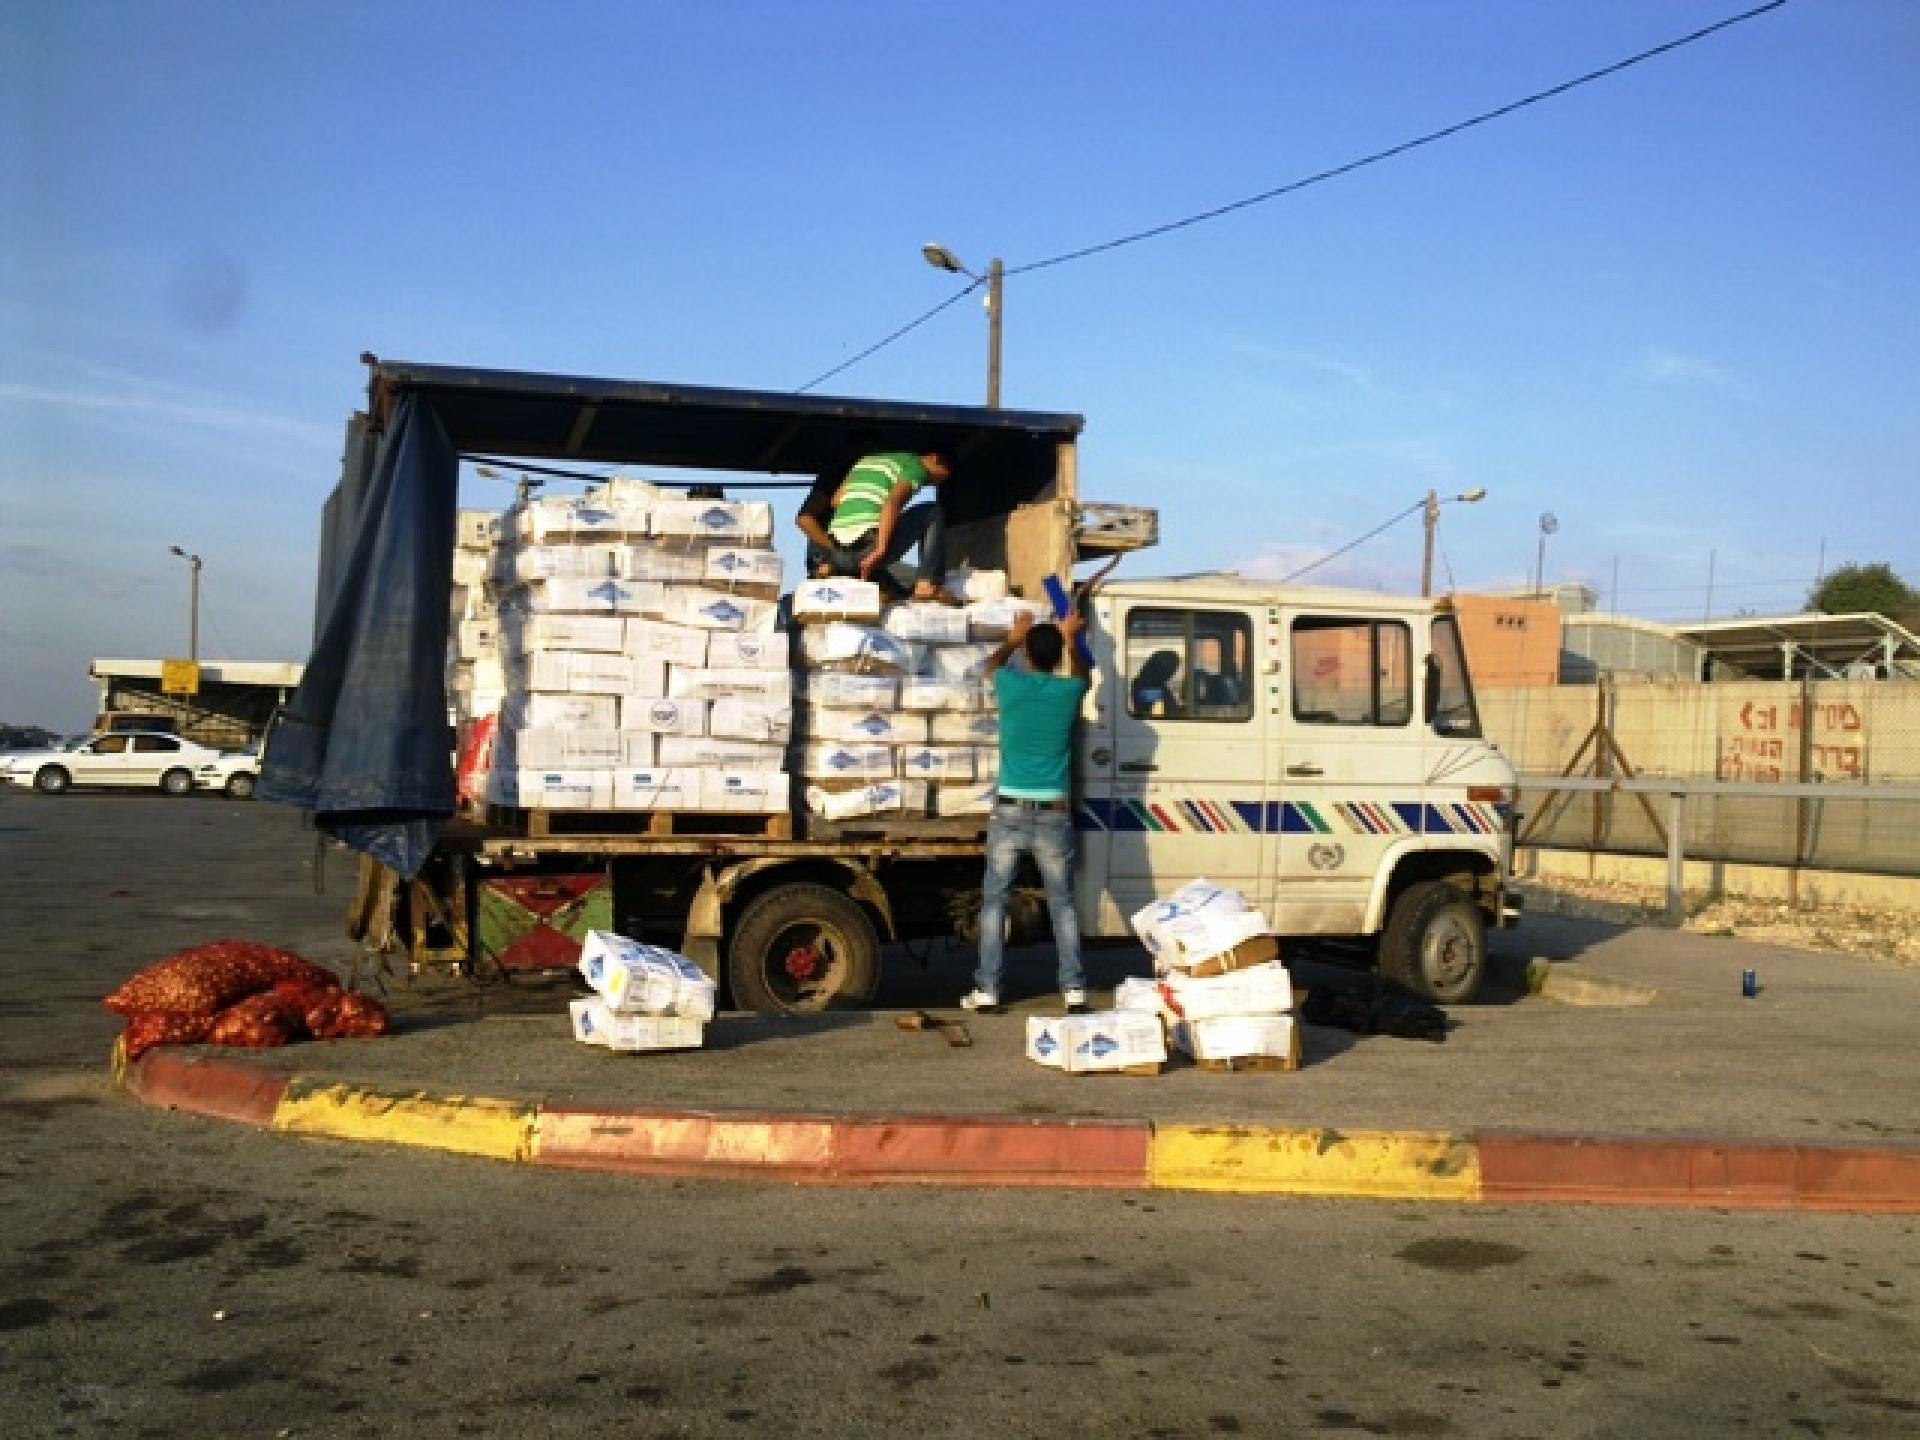 Barta'a/Reikhan checkpoint 03.11.11